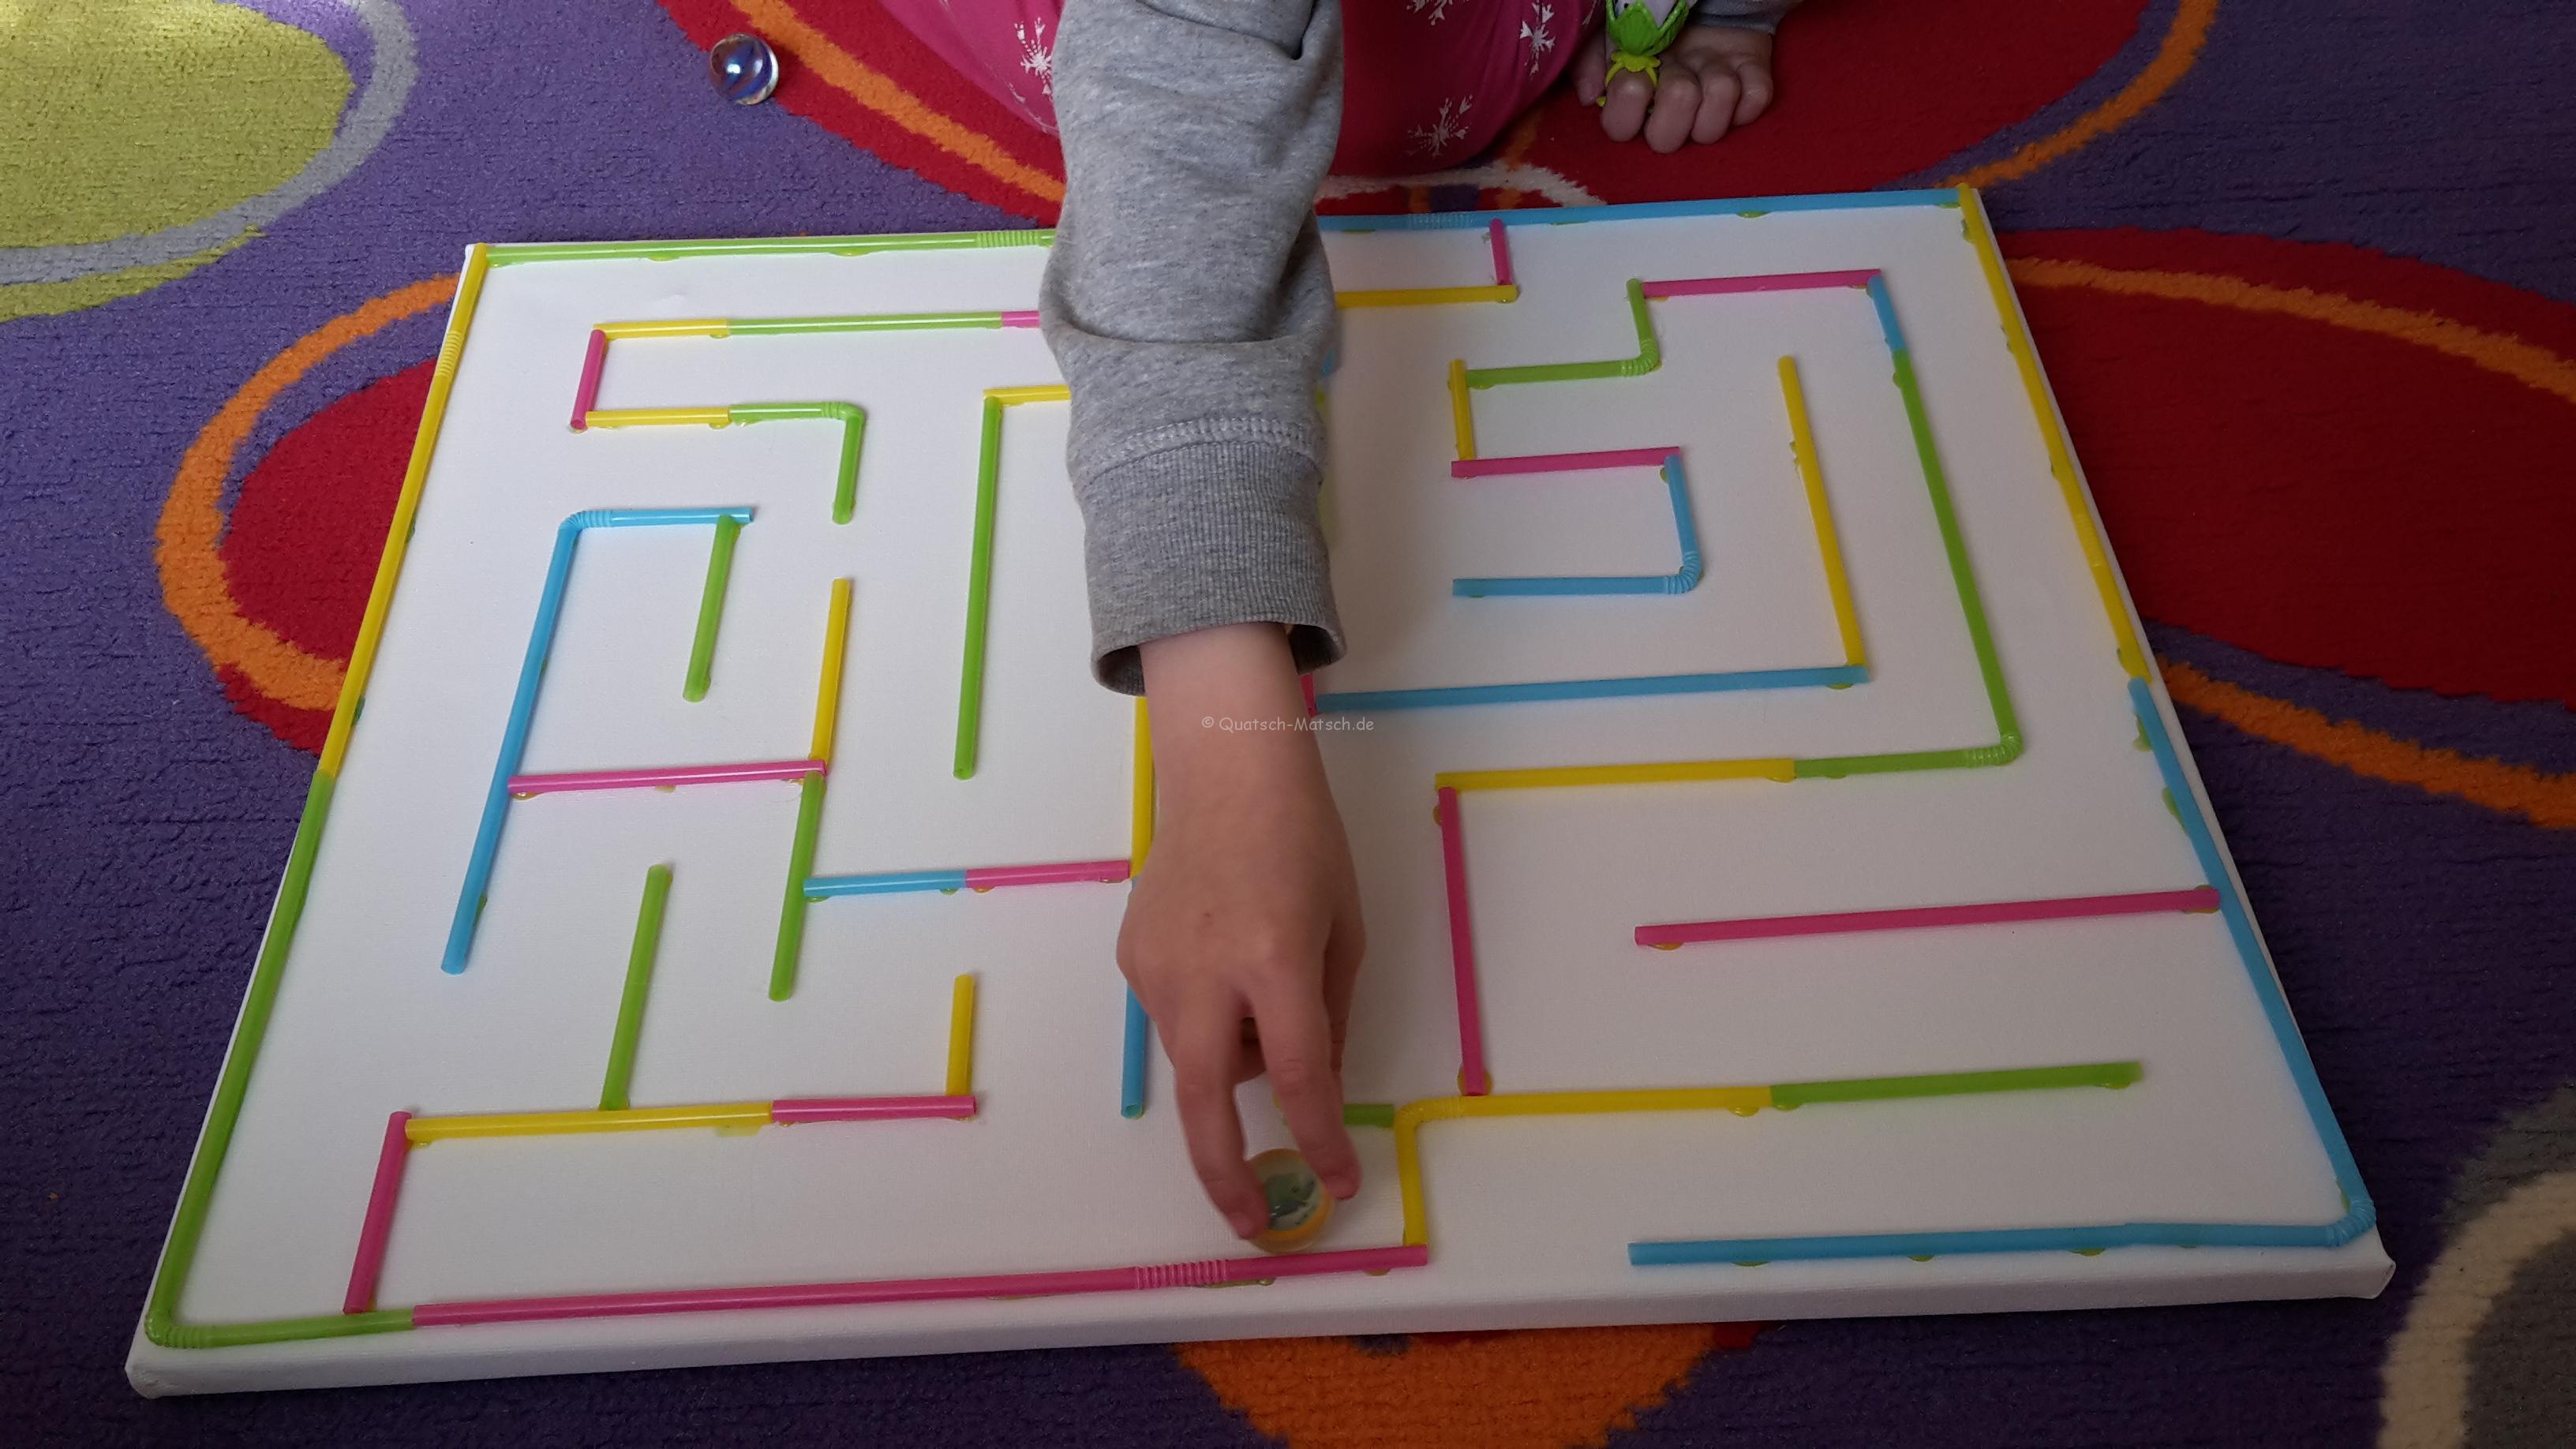 Strohhalm Labyrinth Spielidee – DIY